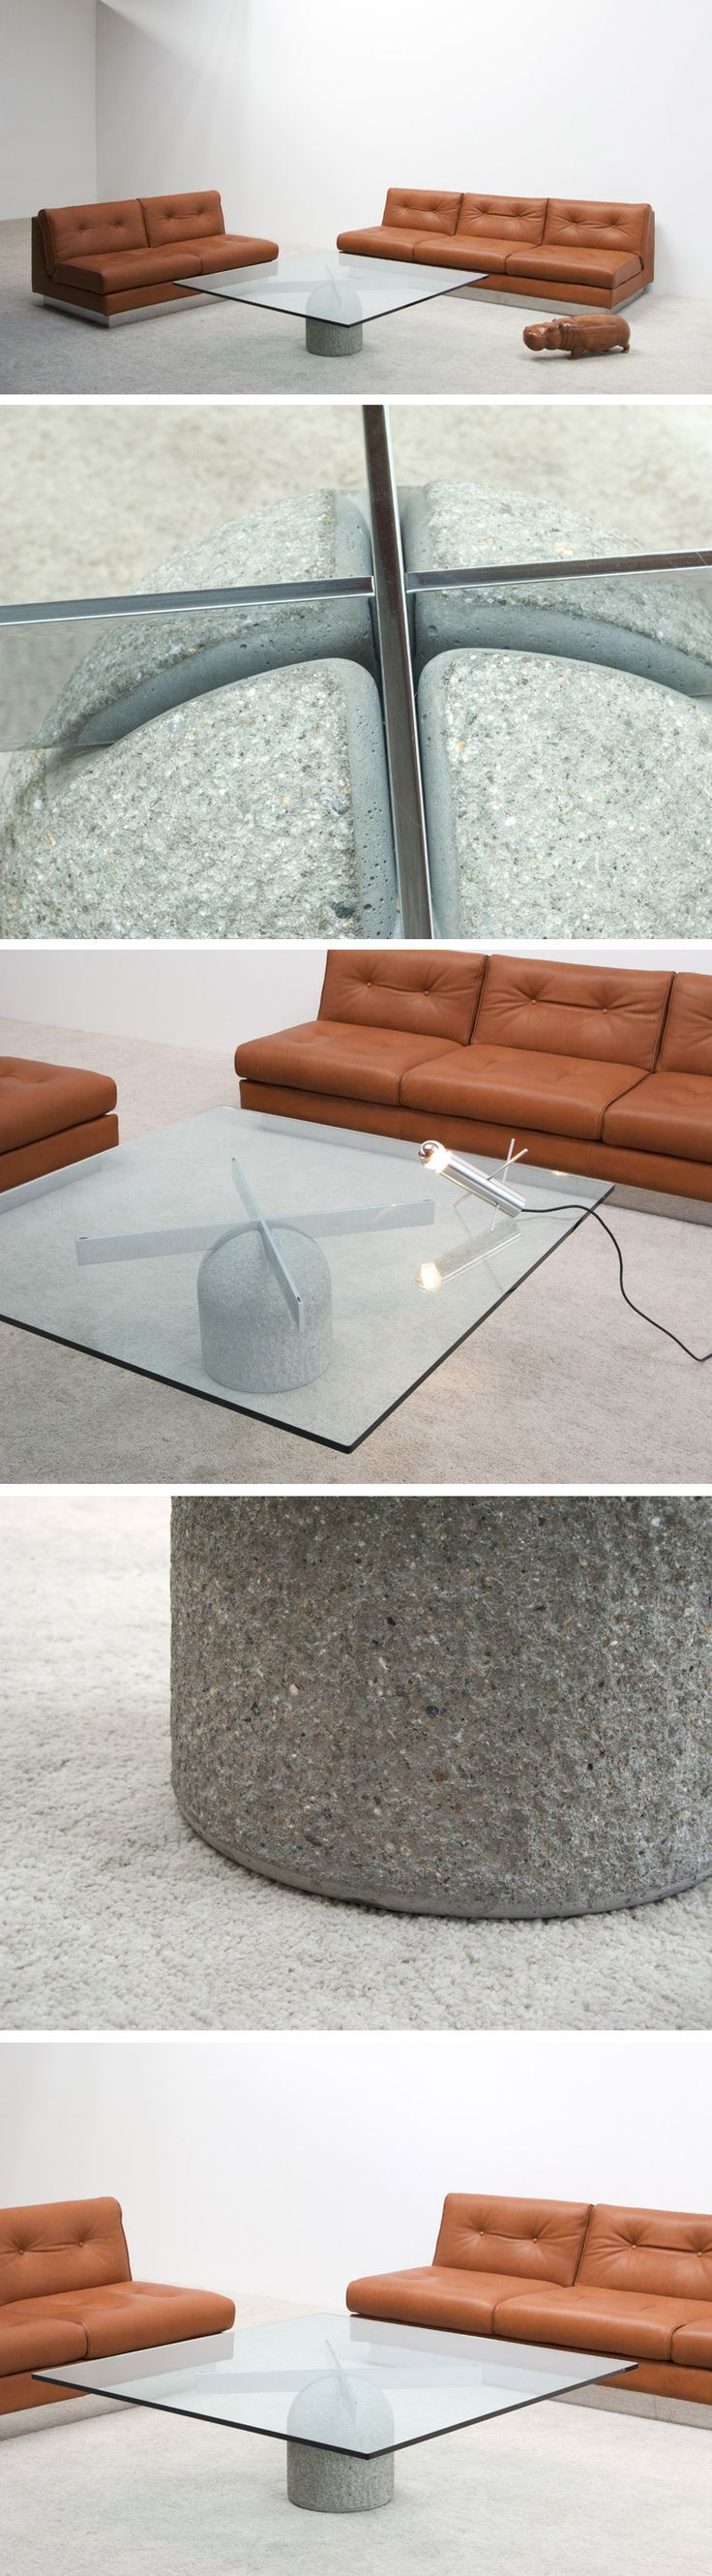 7276609f1ecd876b1a0fd26eb49d8745--lounge-furniture-giovanni Incroyable De Table Basse Le Corbusier Concept